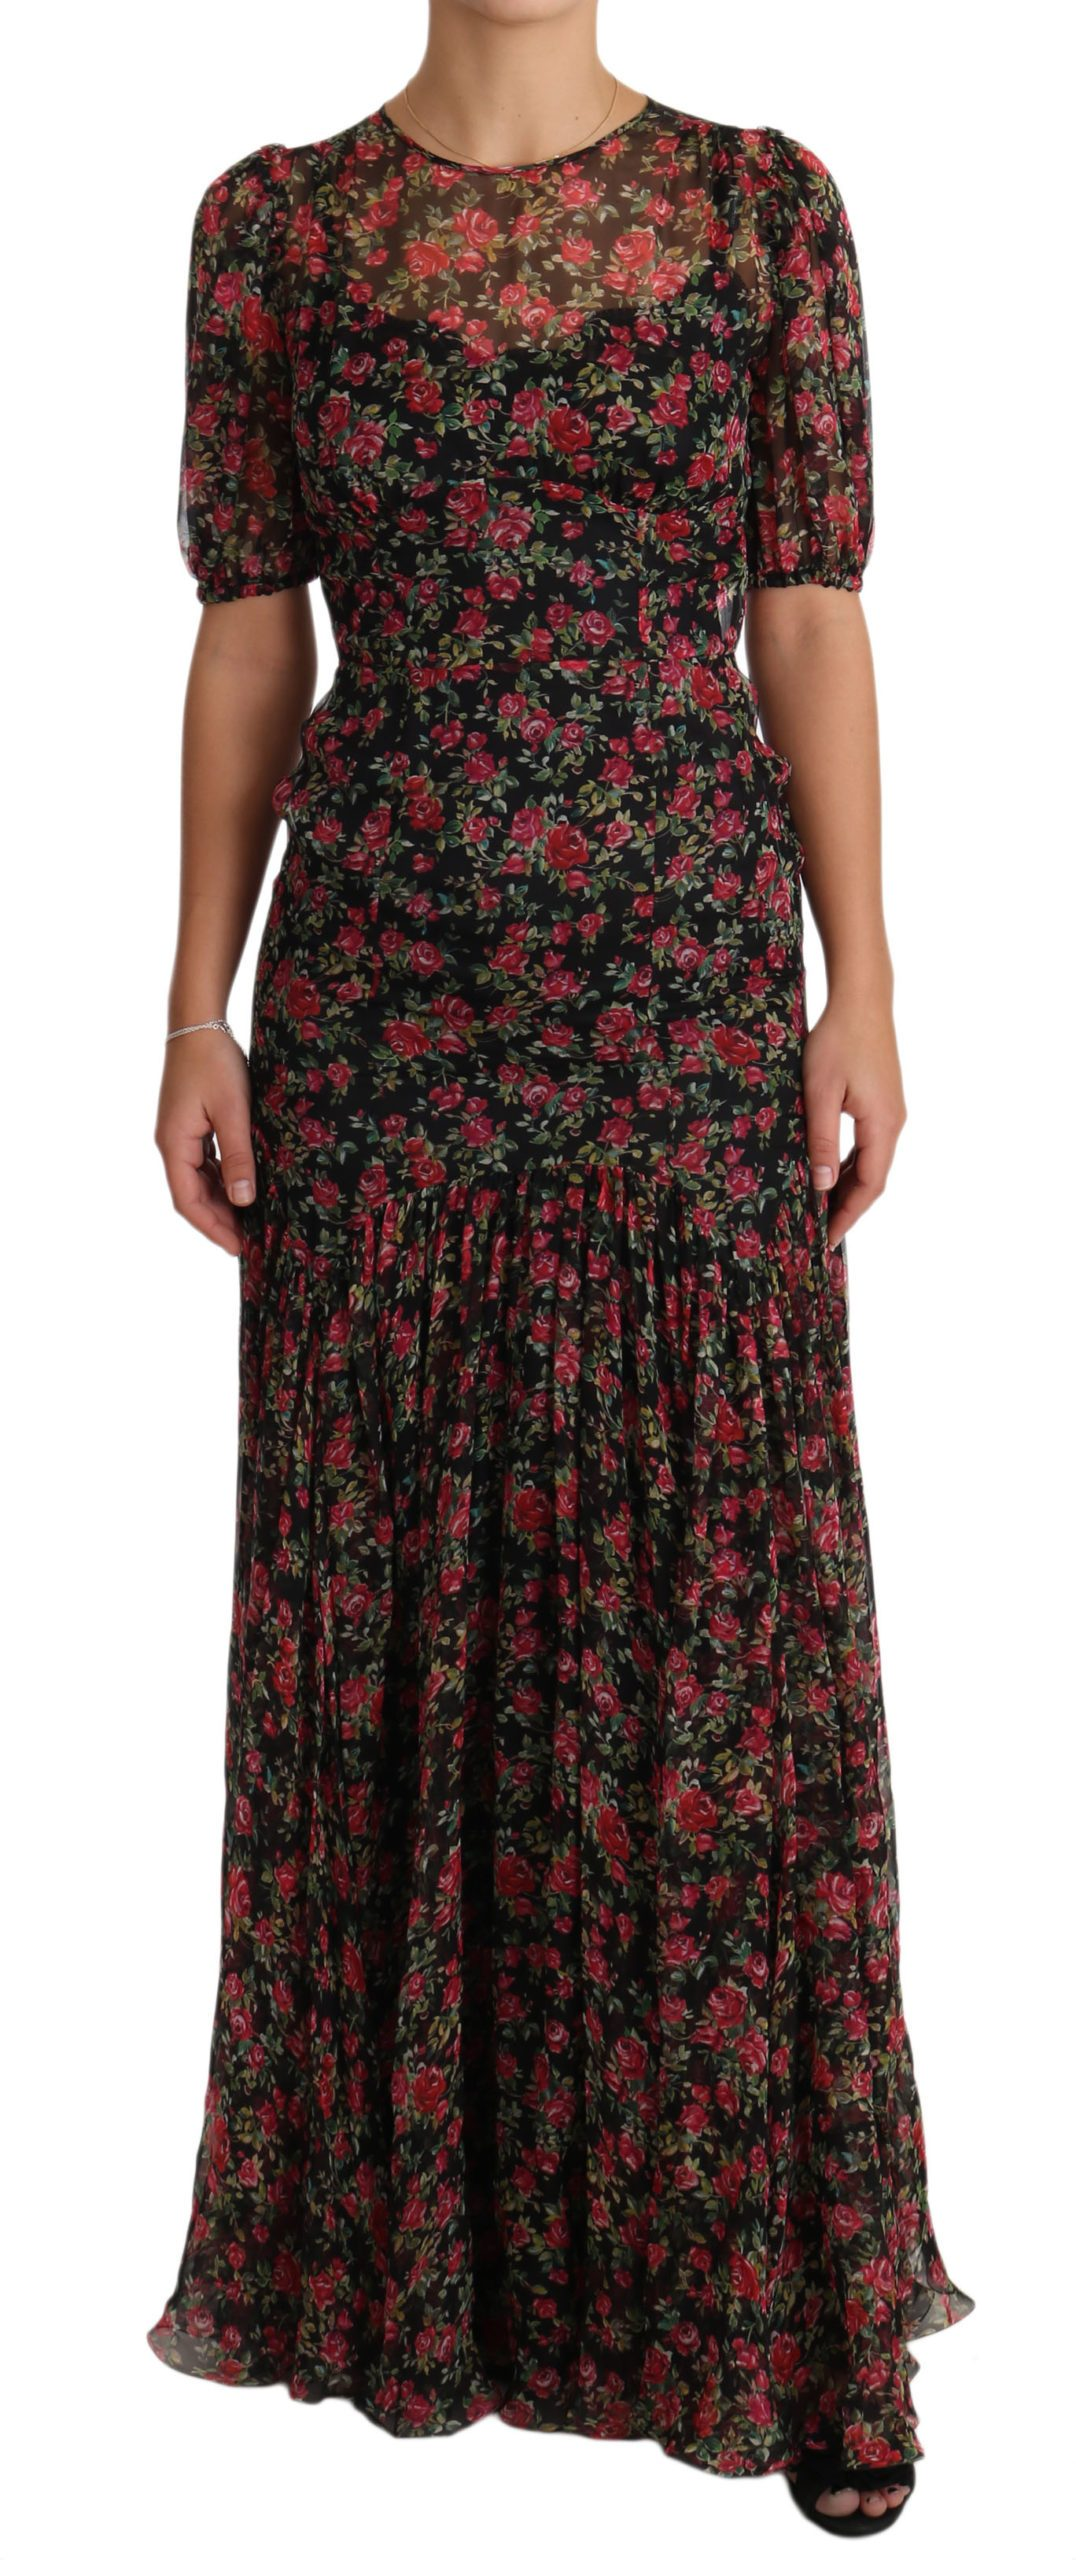 Dolce & Gabbana Women's Dress Black DR1904 - IT38|XS